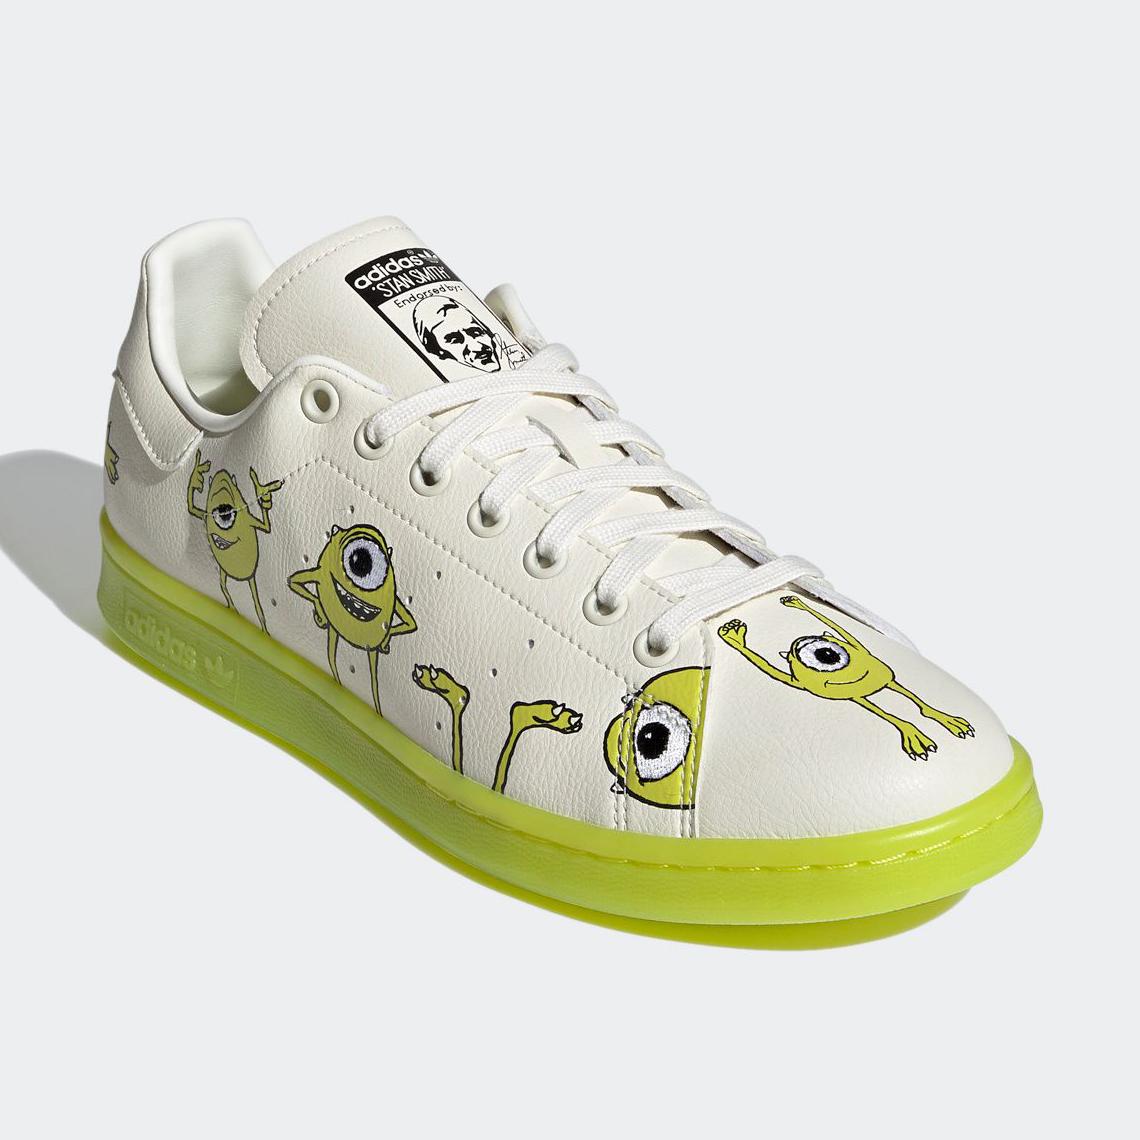 Discriminación sexual eficiencia excusa  Monsters Inc adidas Stan Smith Mike Wazowski FZ2706 | SneakerNews.com